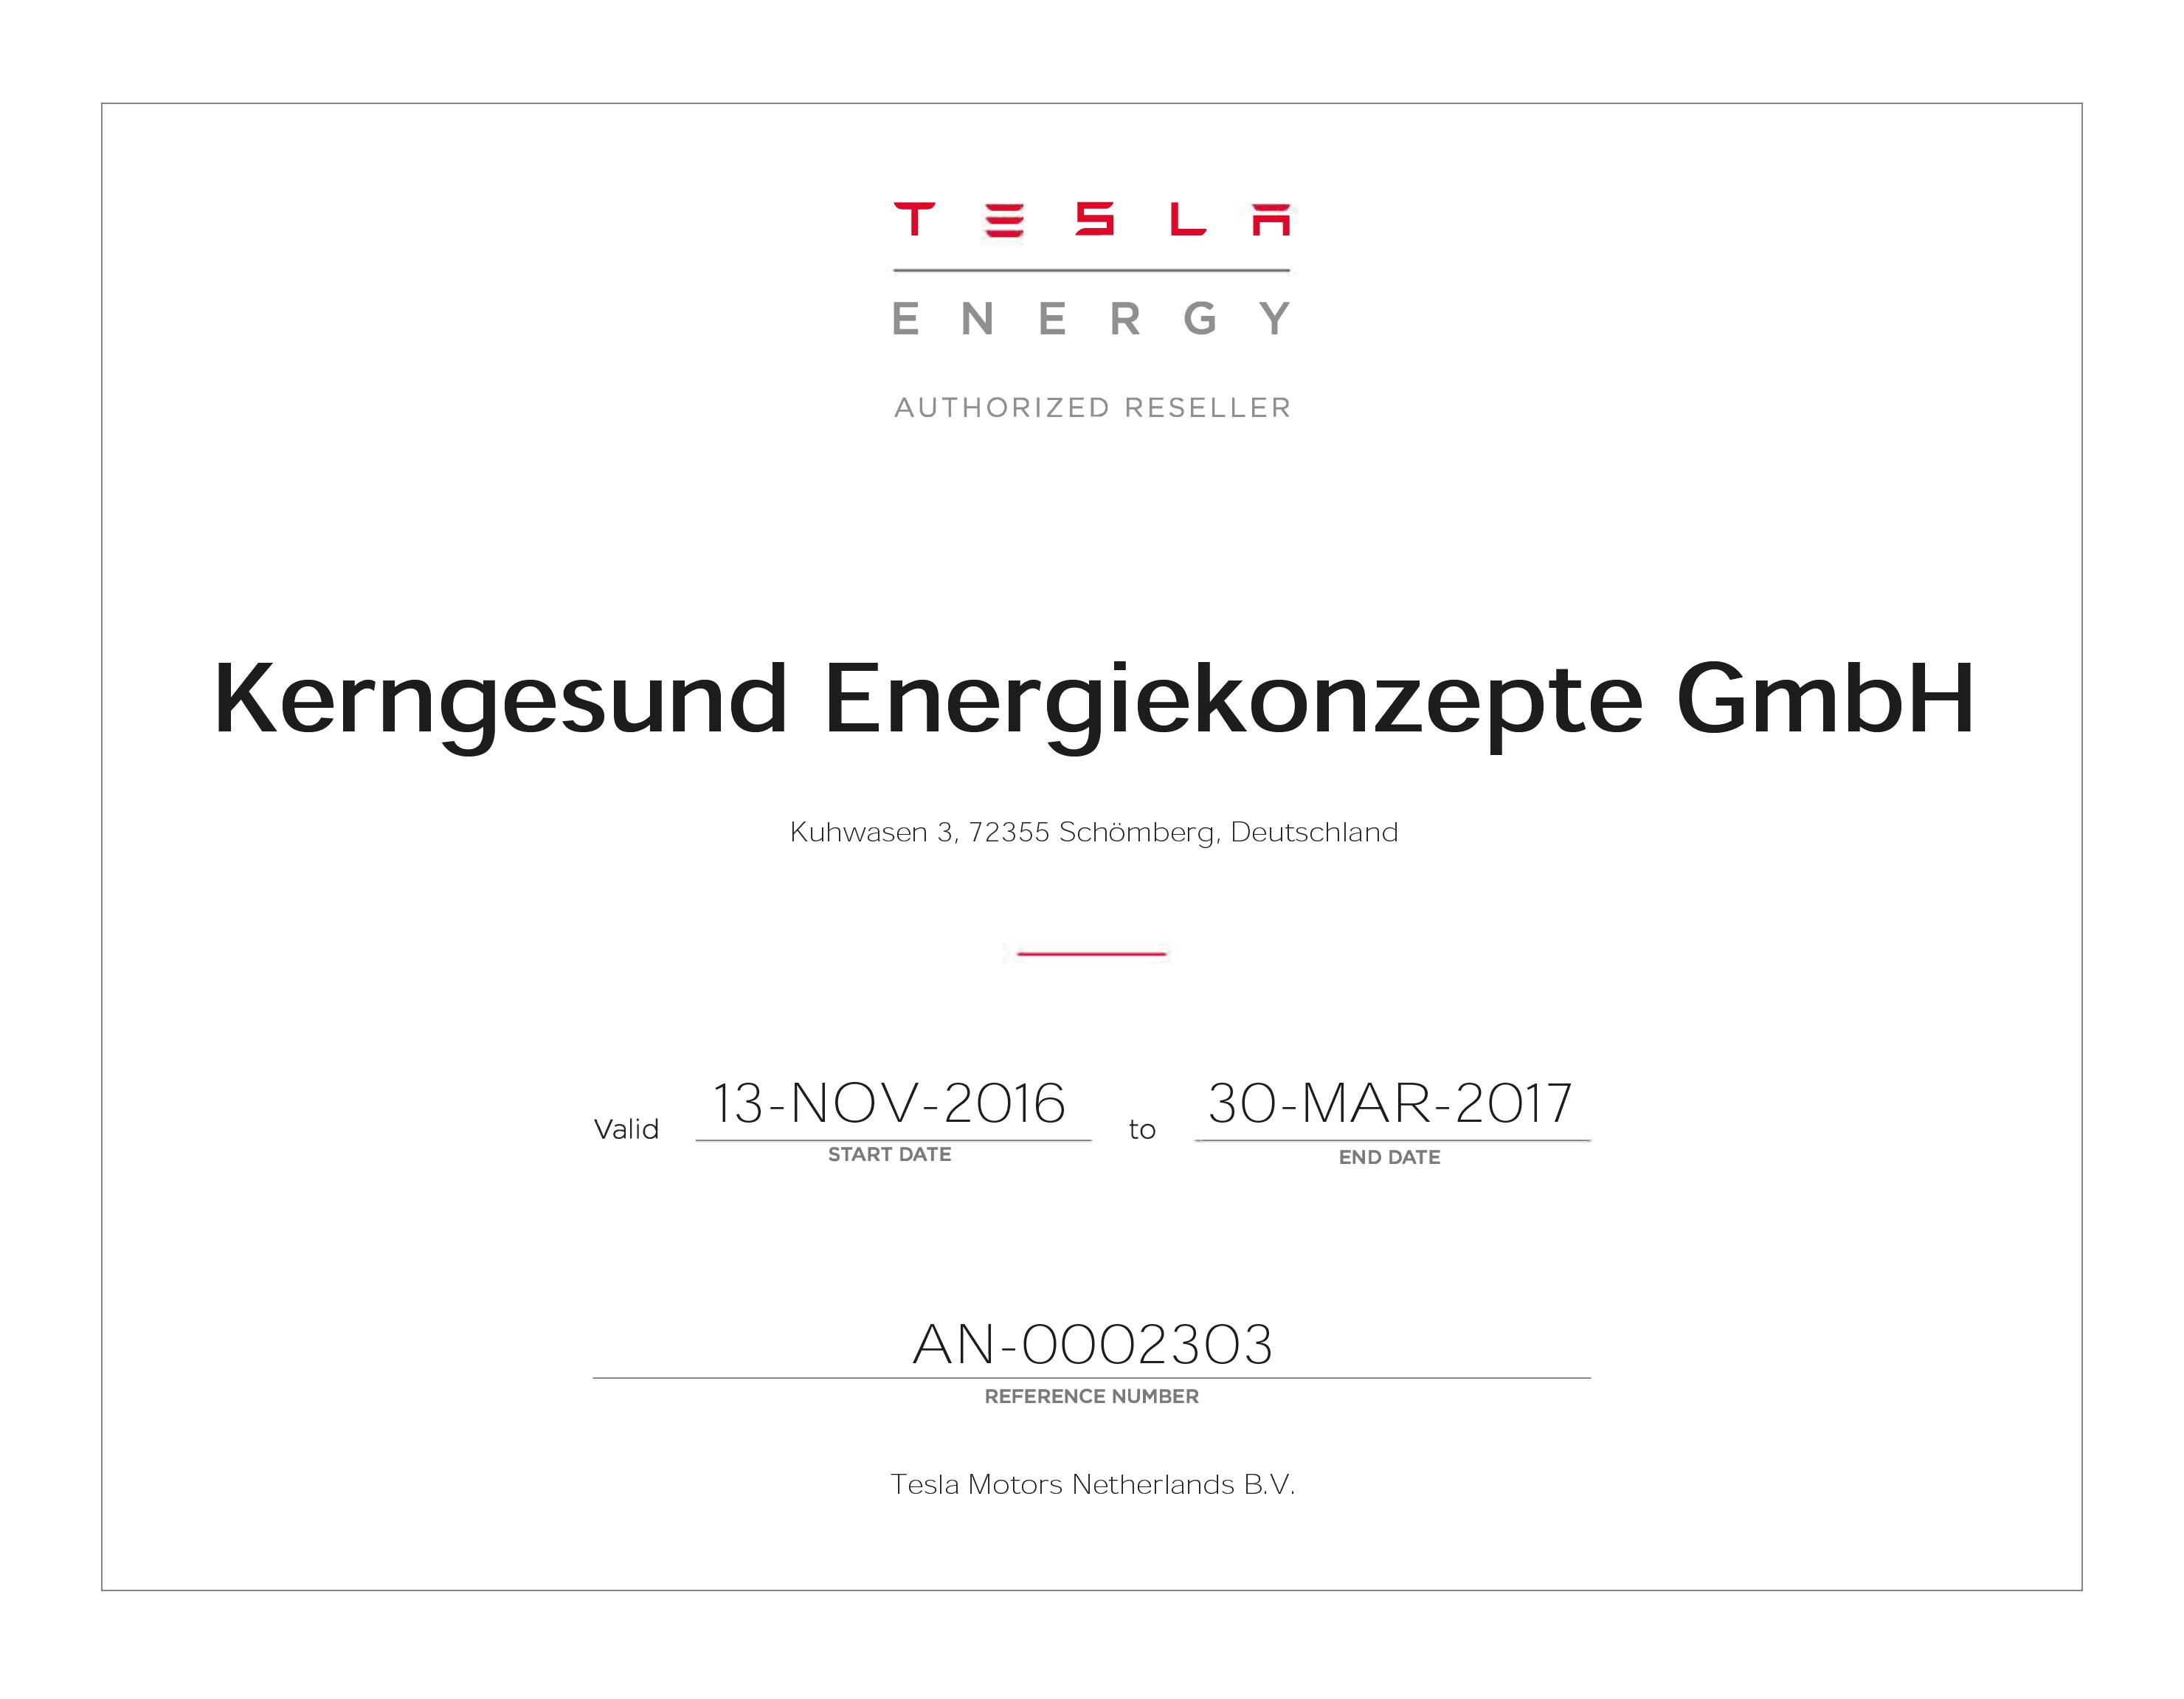 Zertifikat - TESLA ENERGY - AUTHORIZED RESELLER - Kerngesund Energiekonzepte GmbH